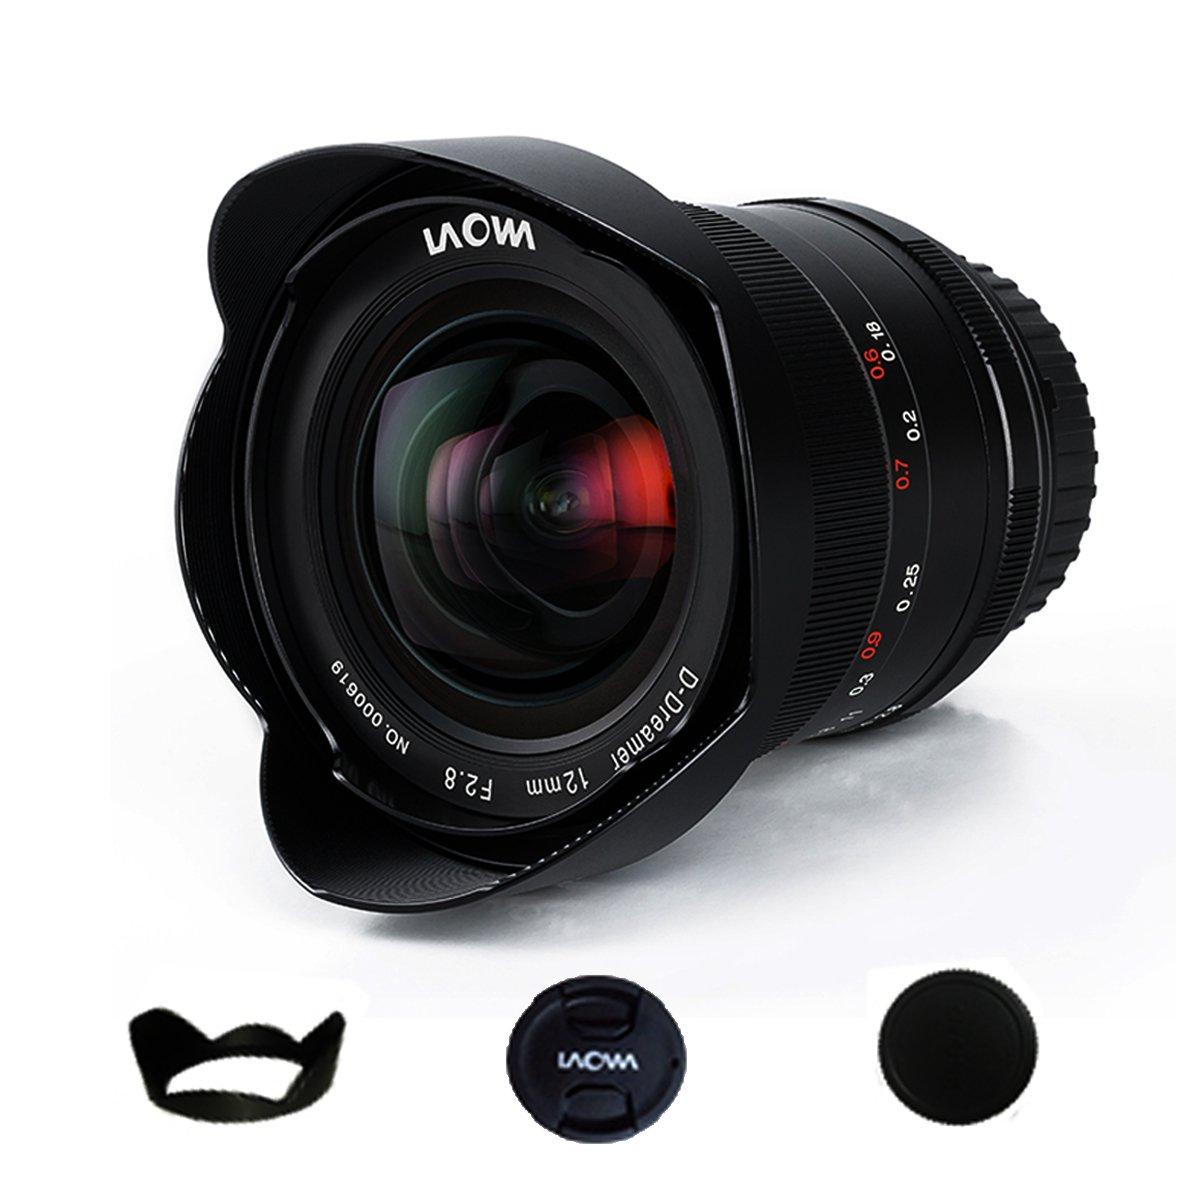 Venus Laowa 12mm f/2.8 Zero-D Ultra-WideAngle for Nikon AI Mount Cameras D850 D810 D5 D610 D750 D4S D810A D4 D700 D5 Laowa12mmF2.8